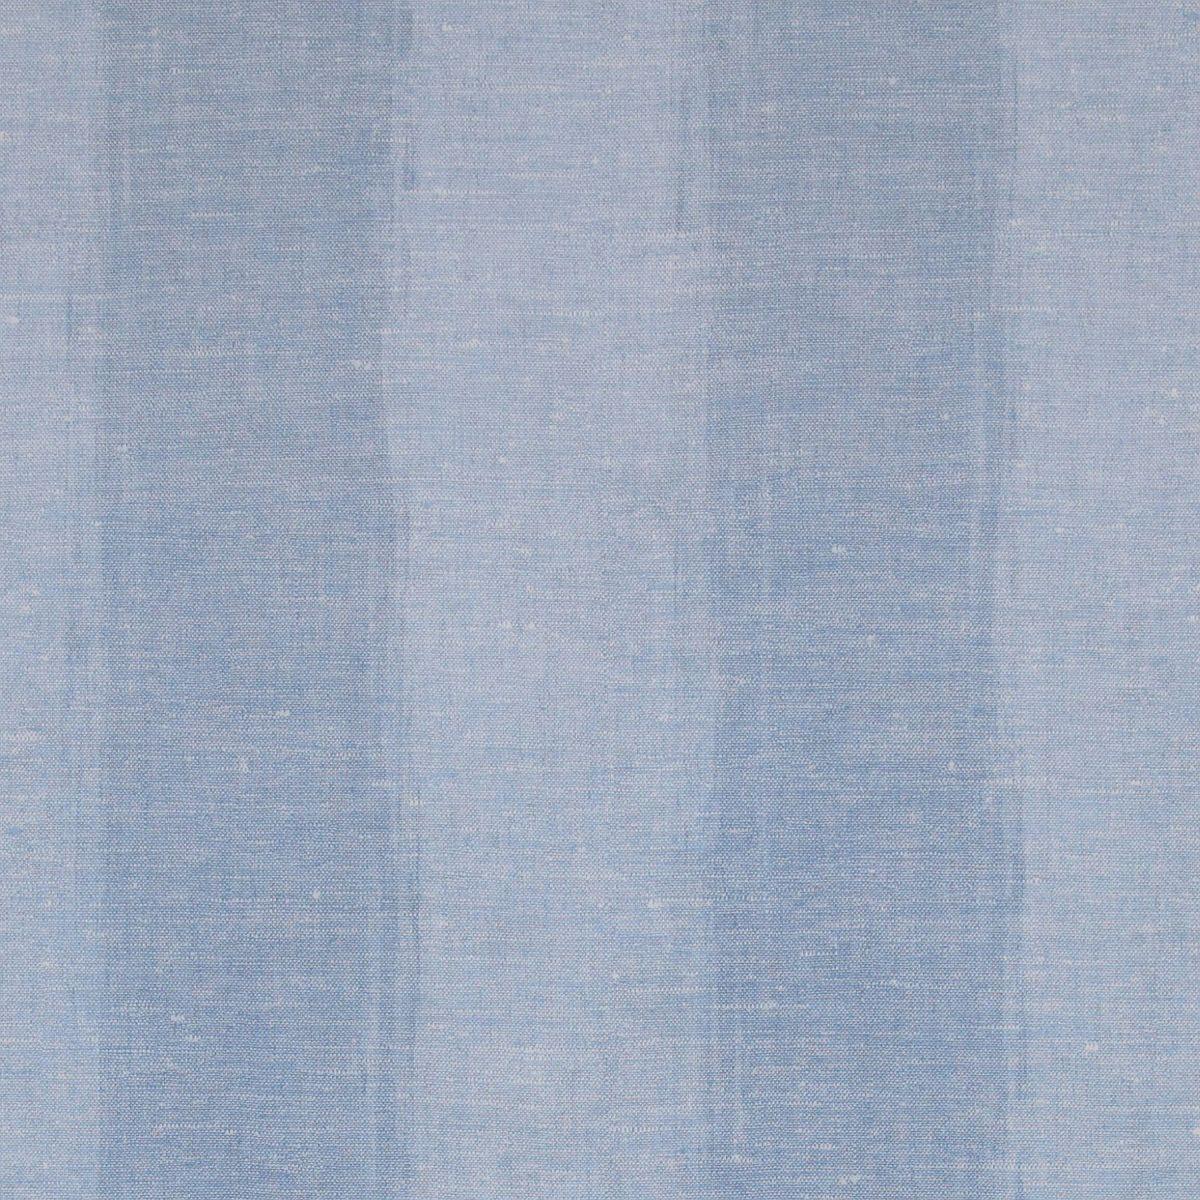 hochwertige tapeten und stoffe b n wallcoverings vliestapete riviera maison 18363 decowunder. Black Bedroom Furniture Sets. Home Design Ideas